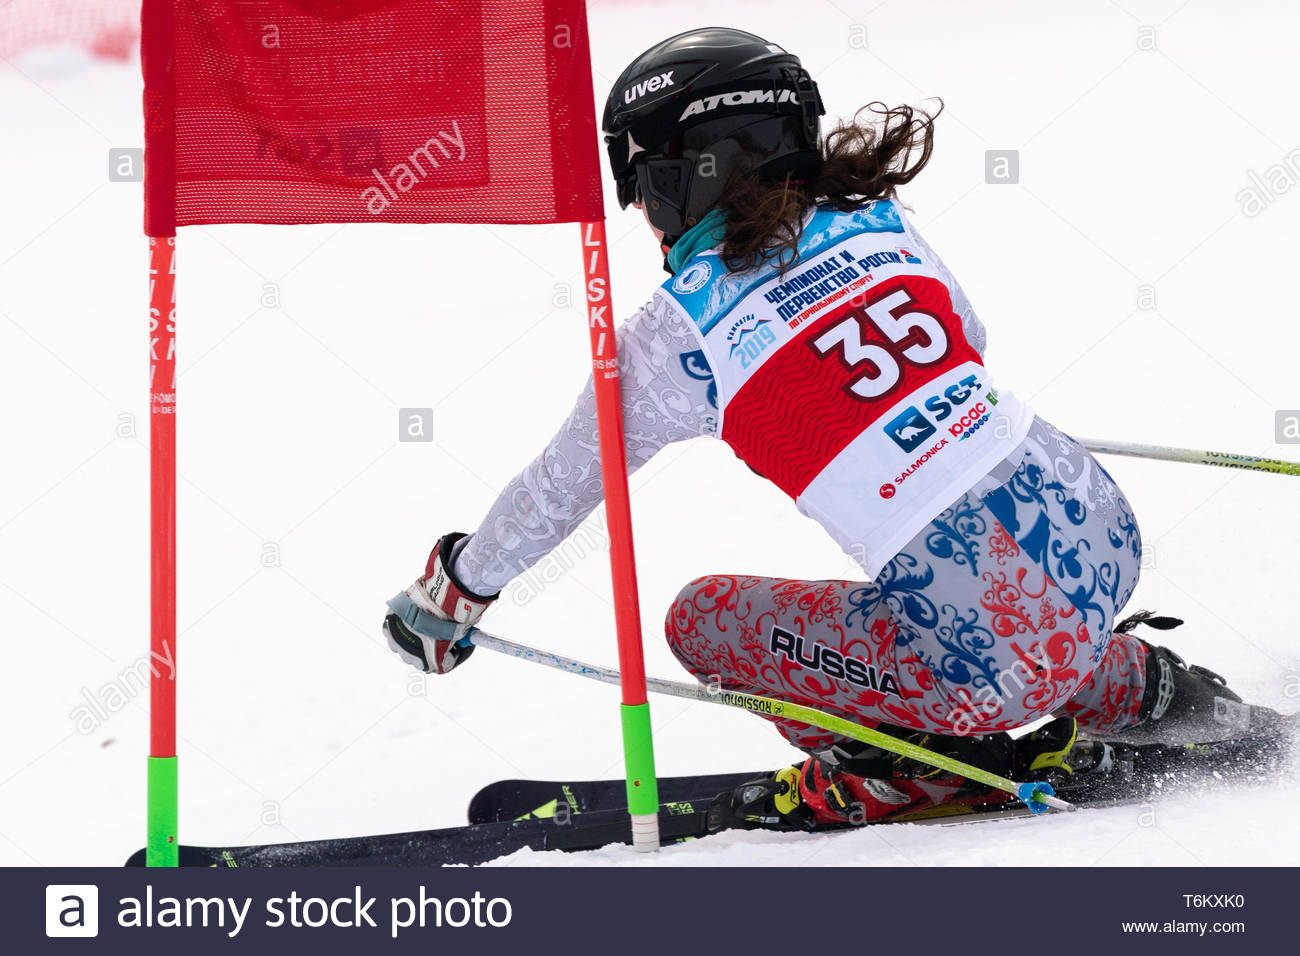 KAMCHATKA PENINSULA, RUSSIA - APR 2, 2019: International Ski Federation Championship, Russian Women's Alpine Skiing Cup, giant slalom. Mountain skier  - Stock Image